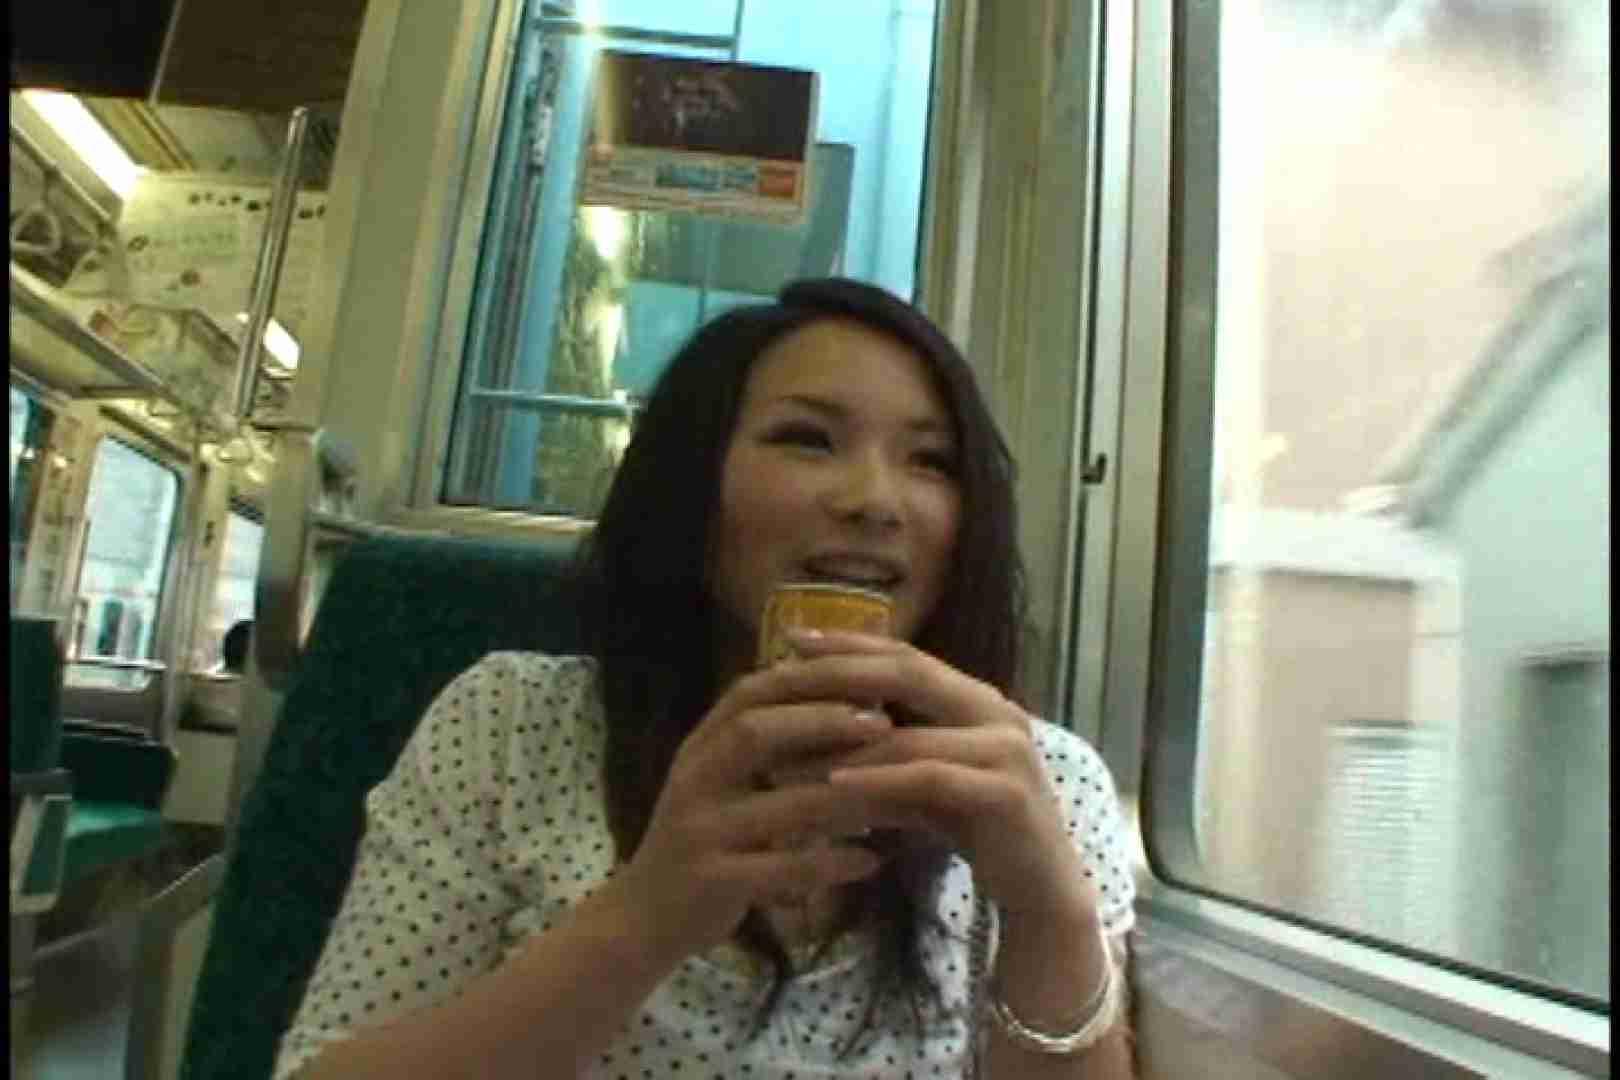 JDハンター全国ツアー vol.045 前編 OLのエロ生活   女子大生のエロ生活  95連発 31